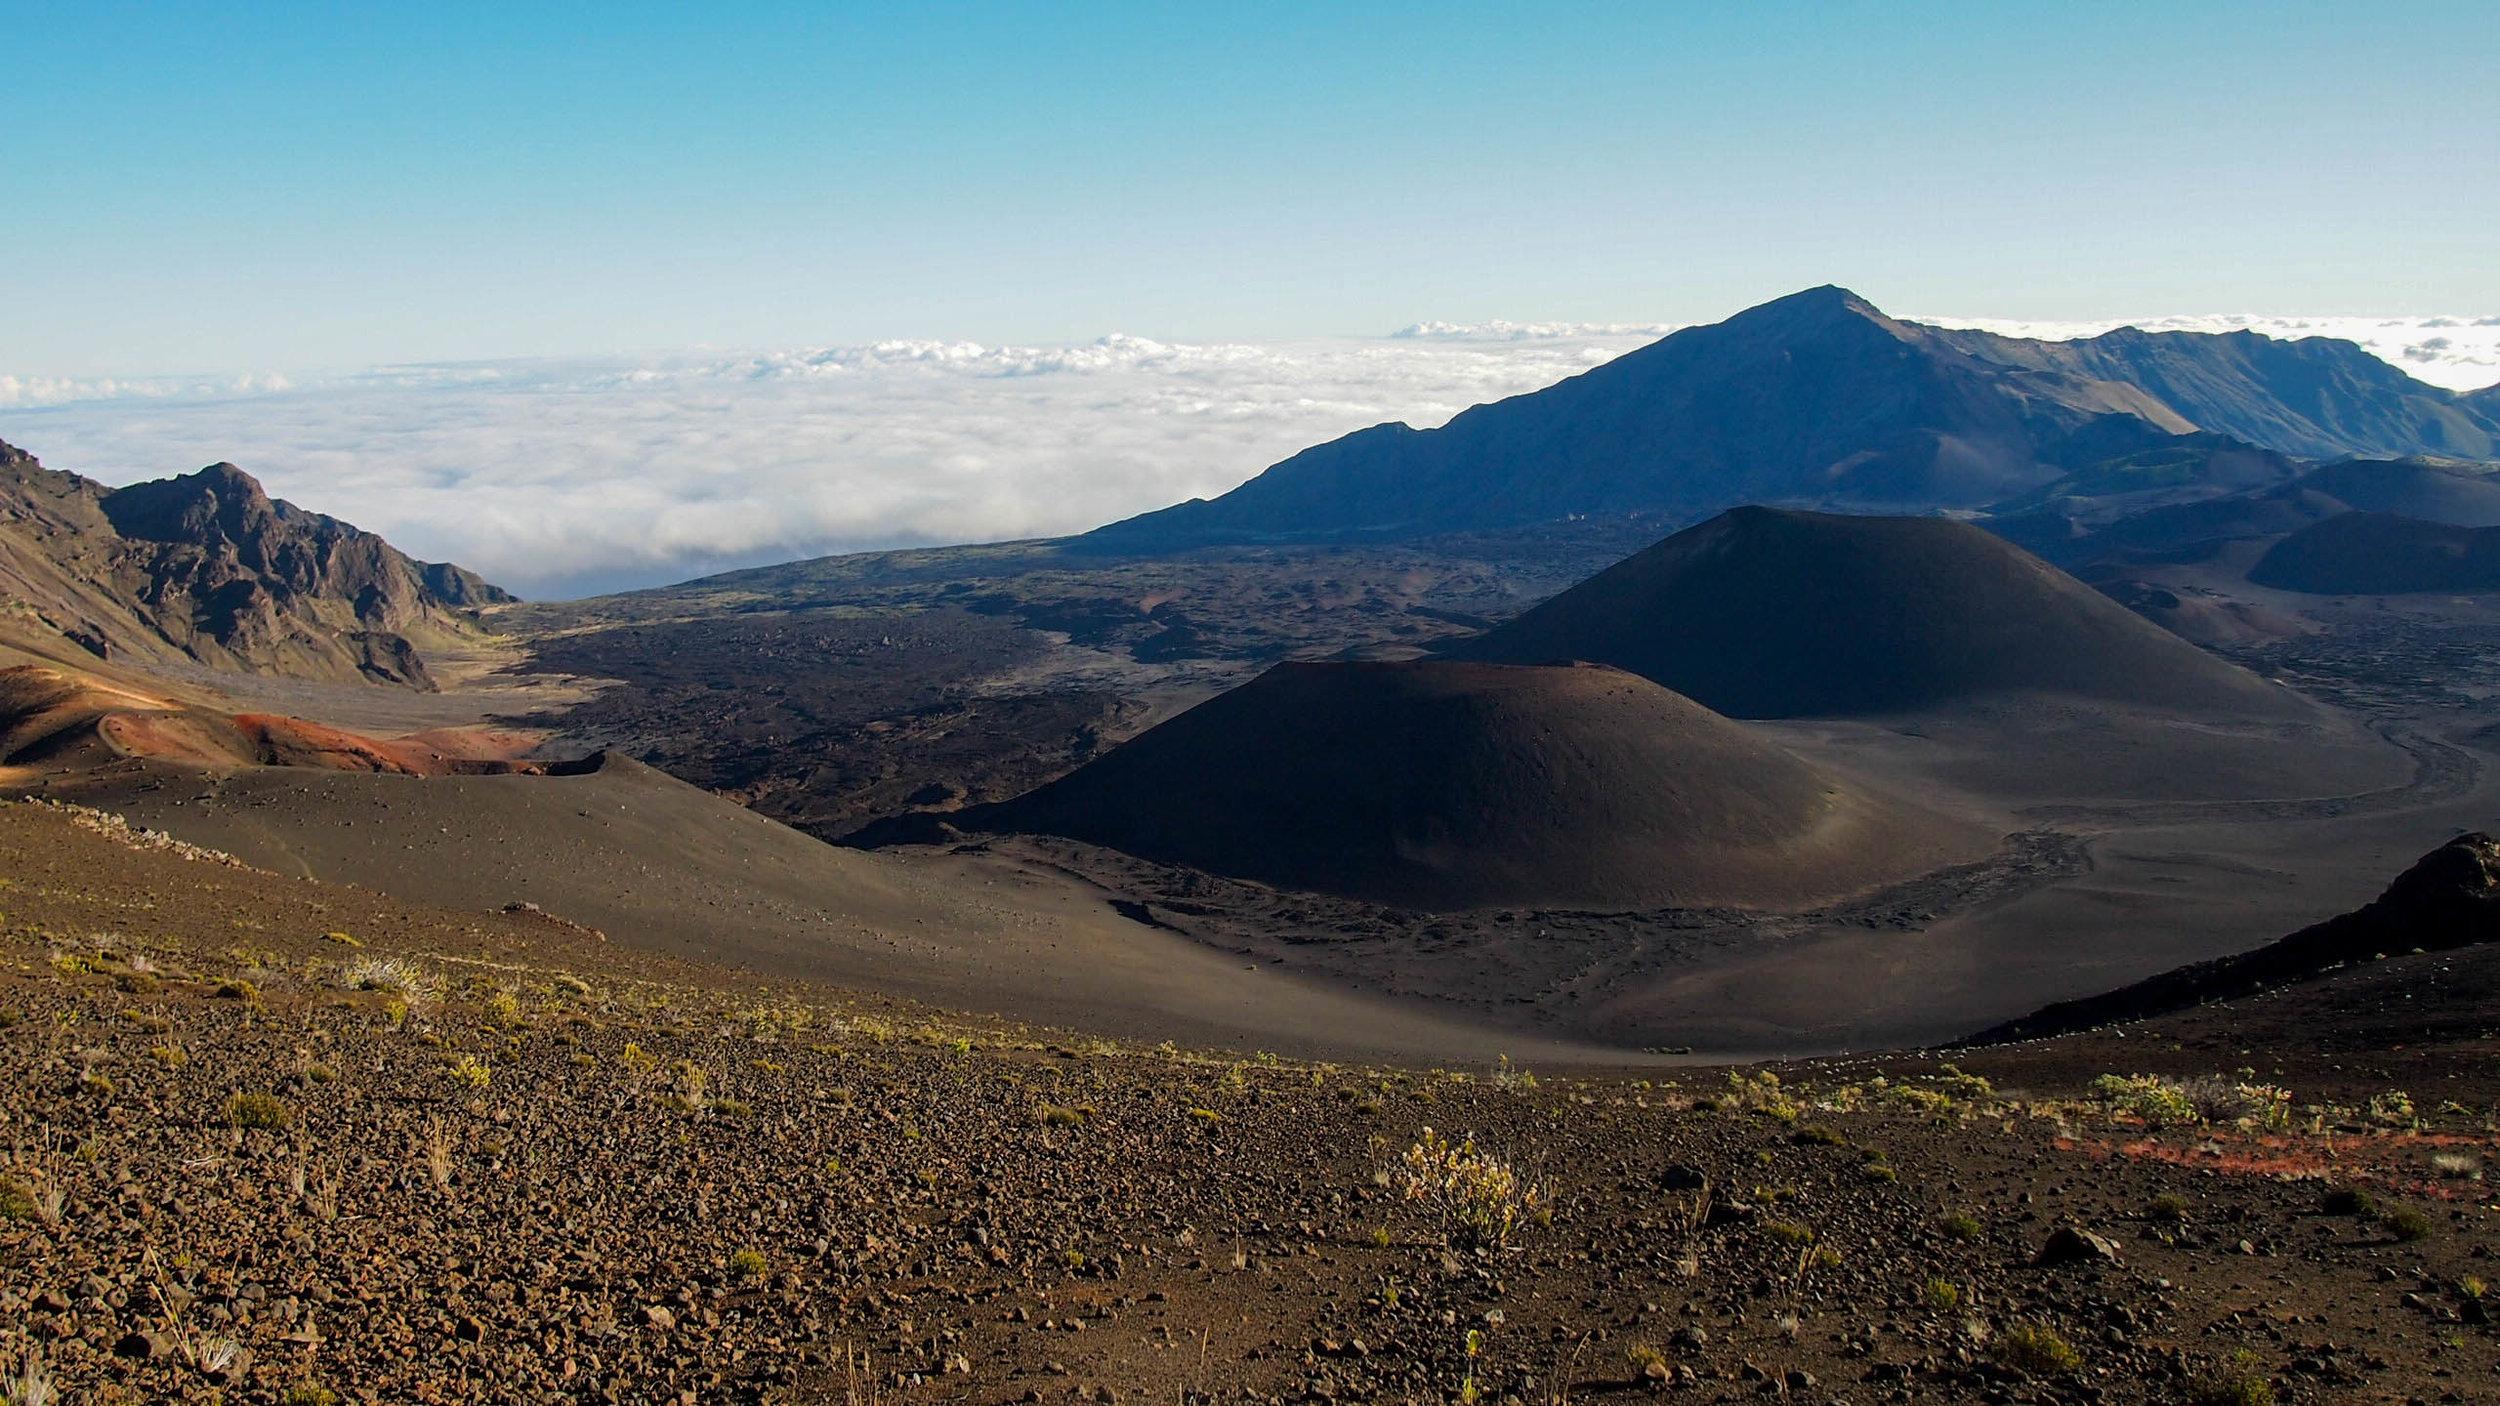 Cinder cones in the crater